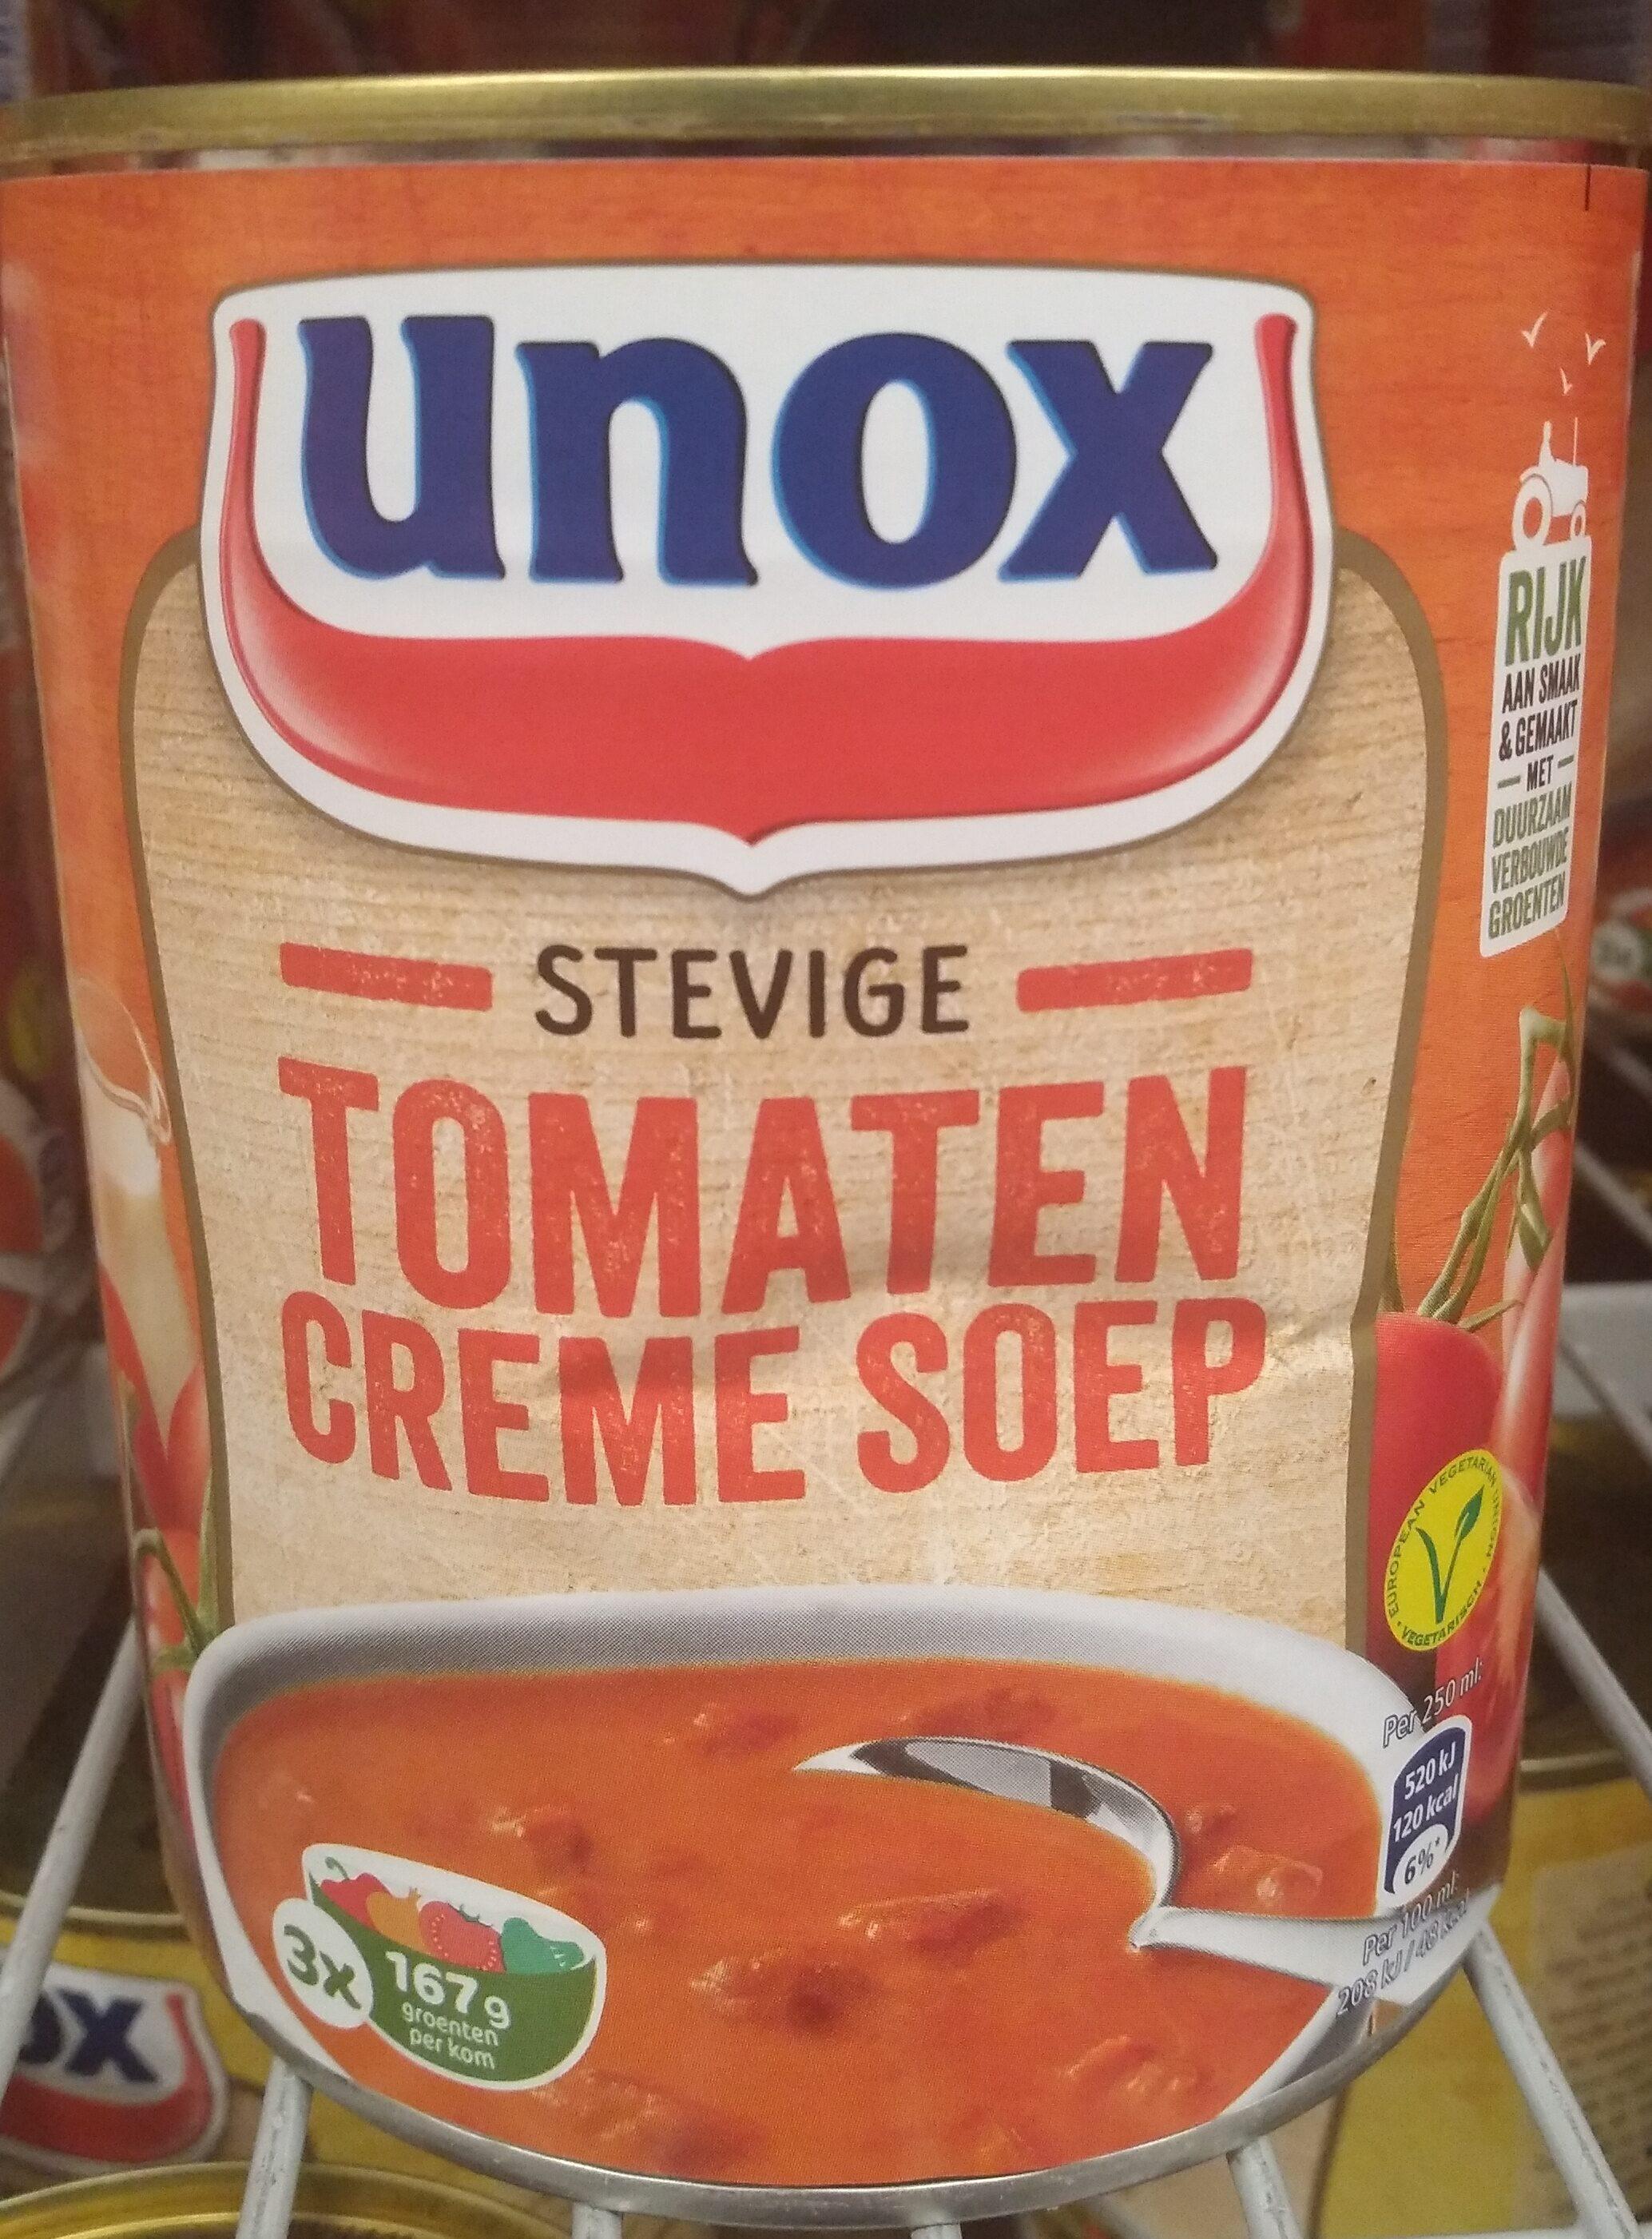 Unox soep - Product - nl